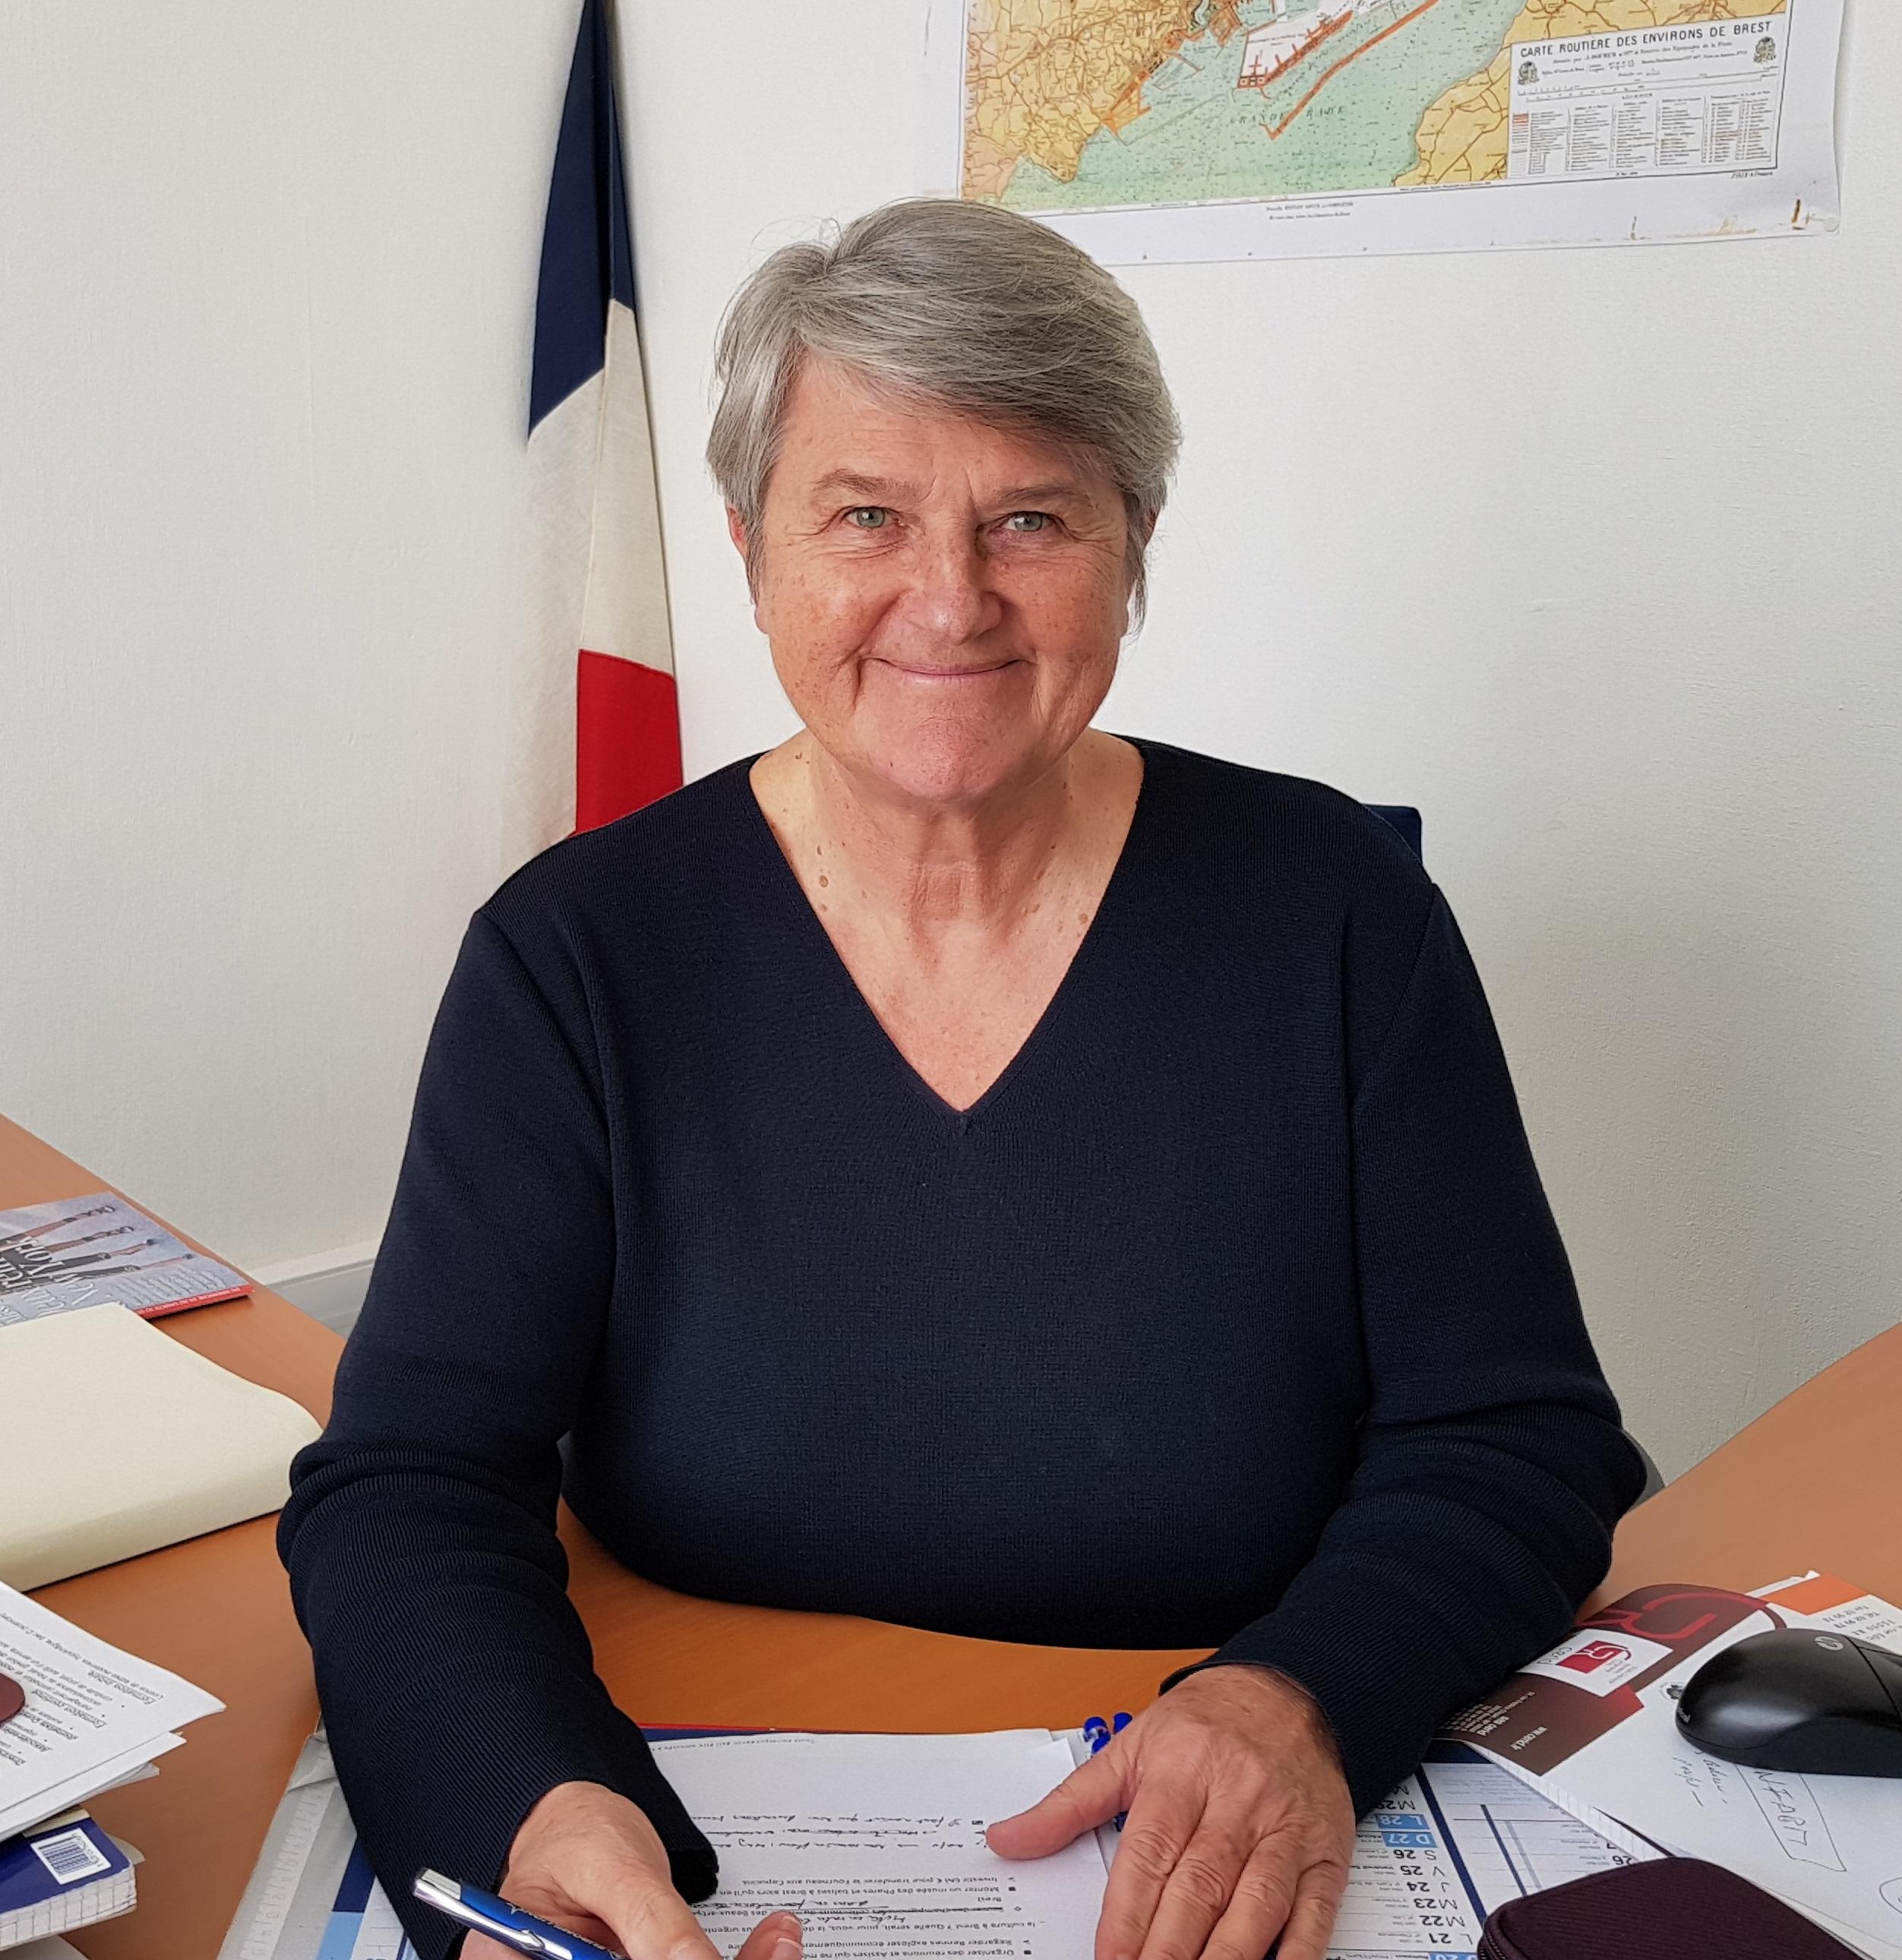 Bernadette Malgorn